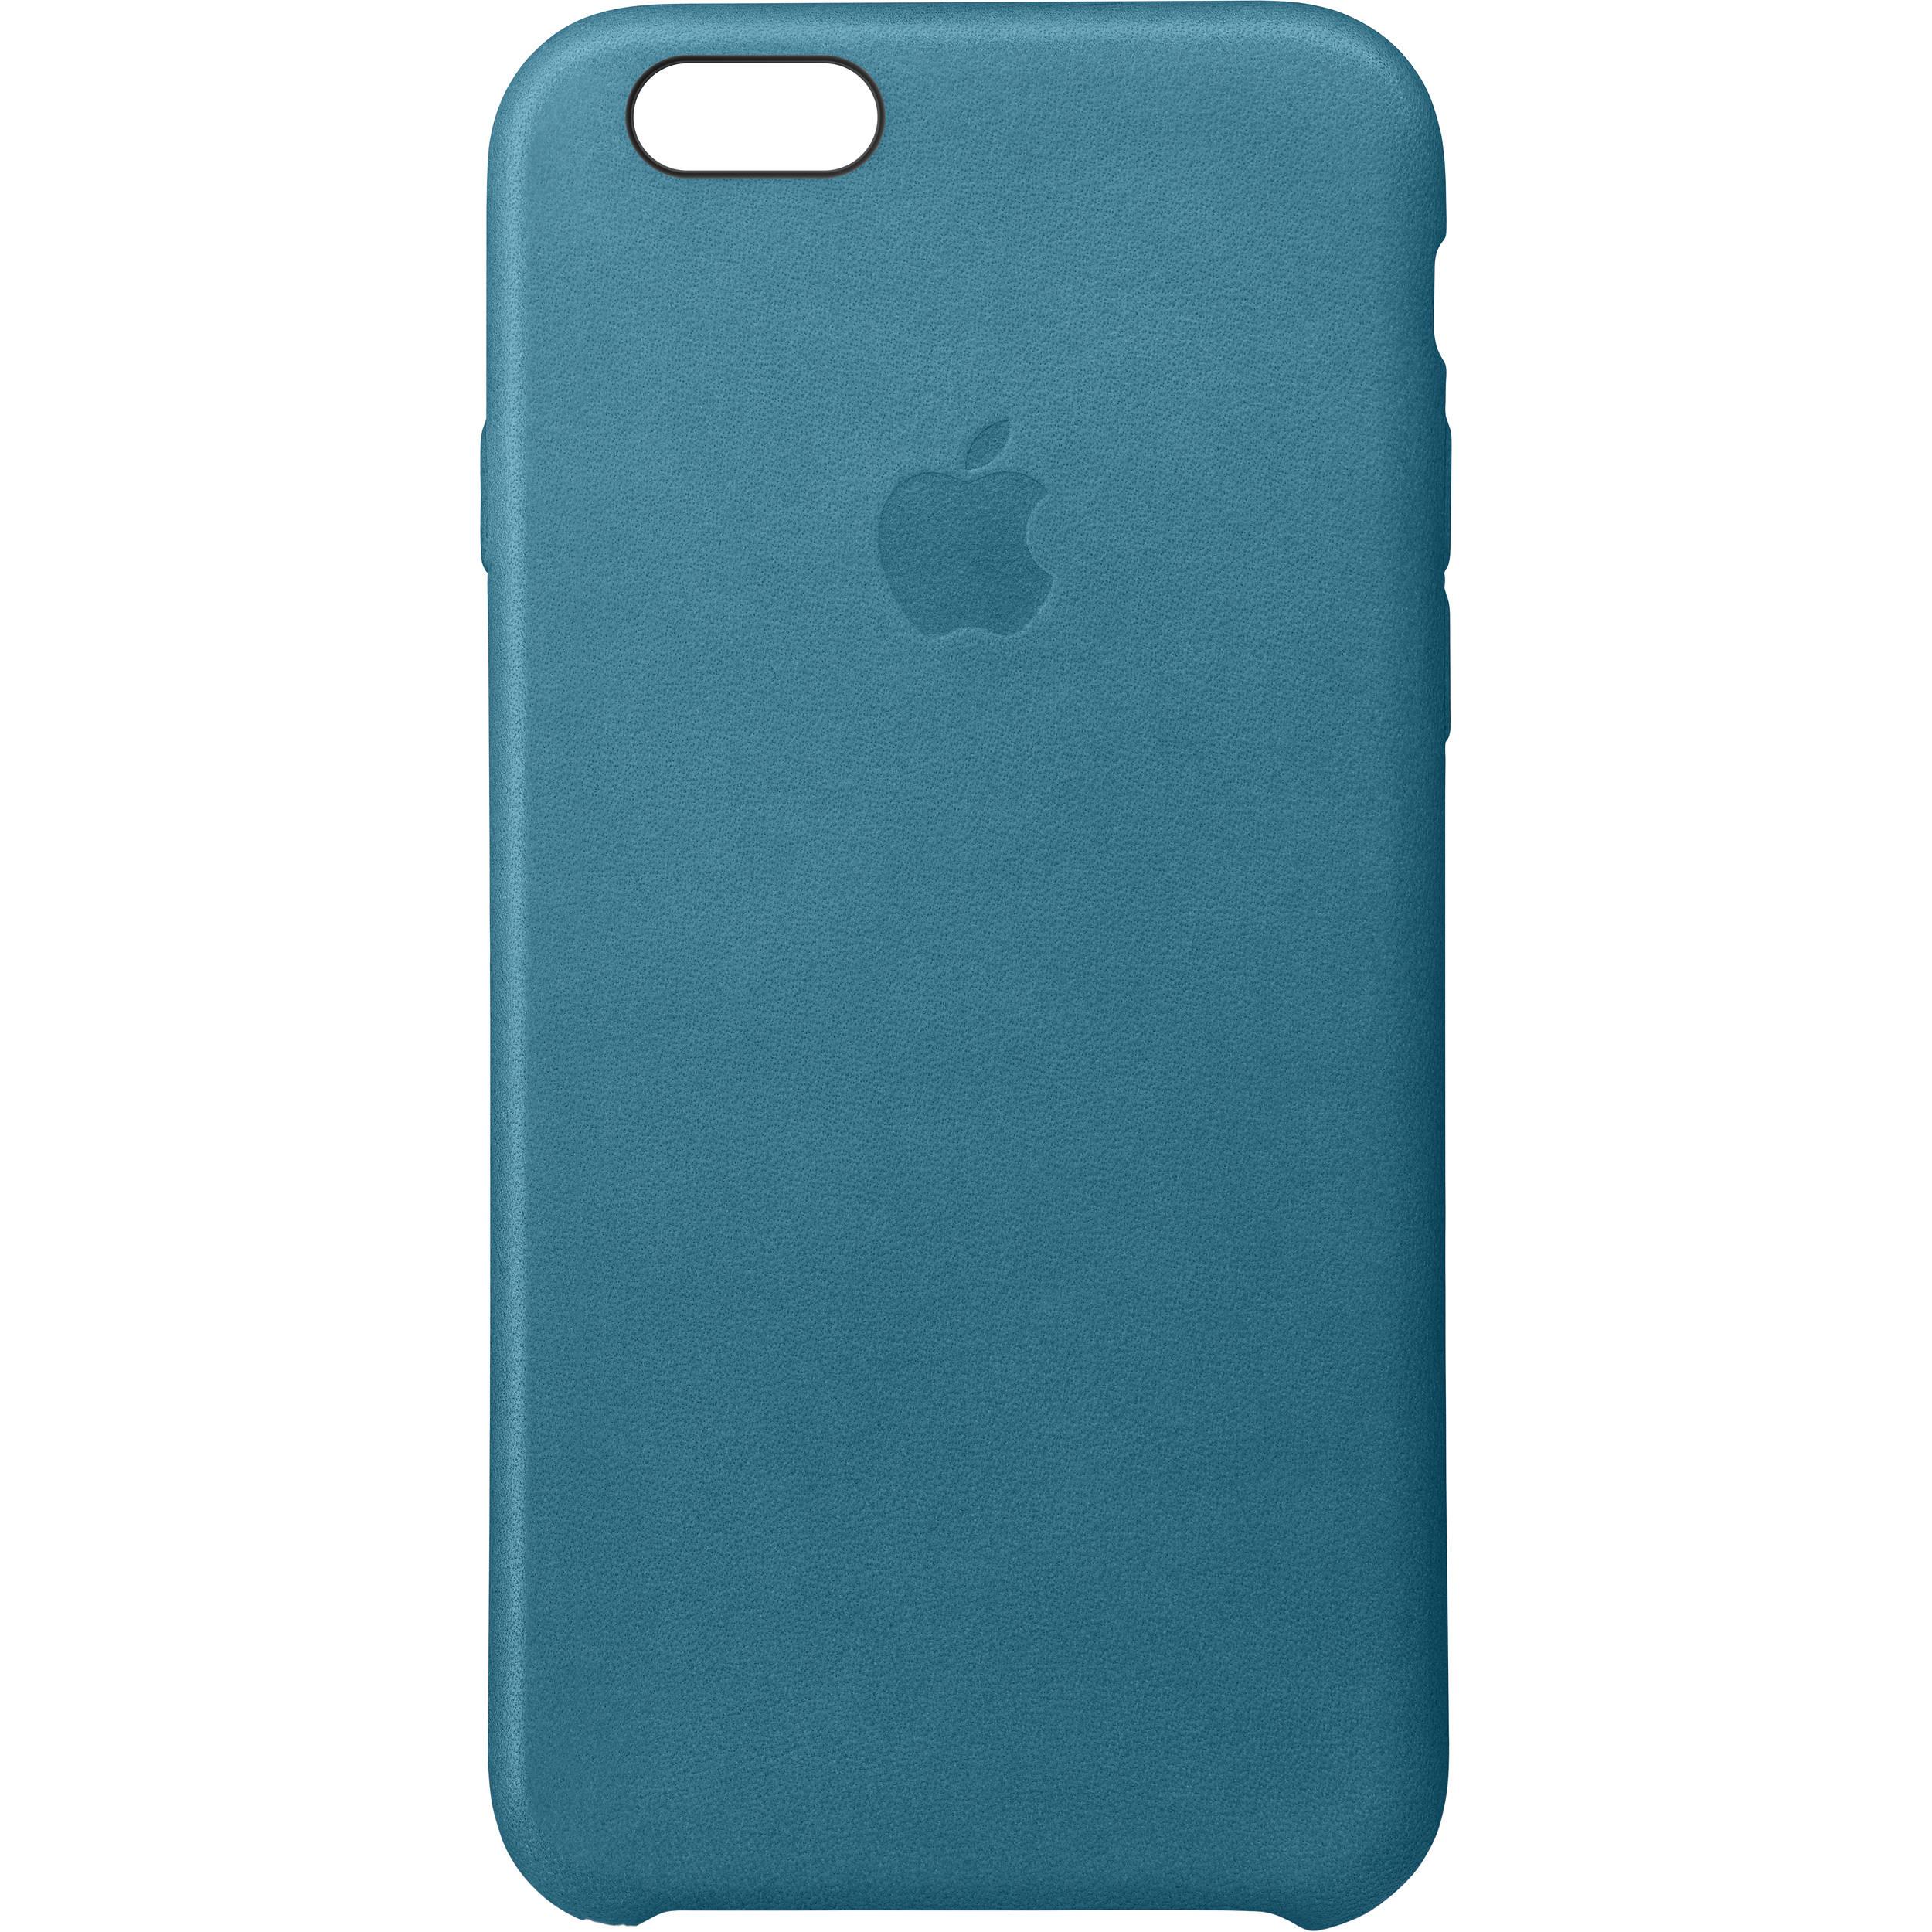 super popular 2e277 c4d2f Apple iPhone 6/6s Leather Case (Marine Blue)